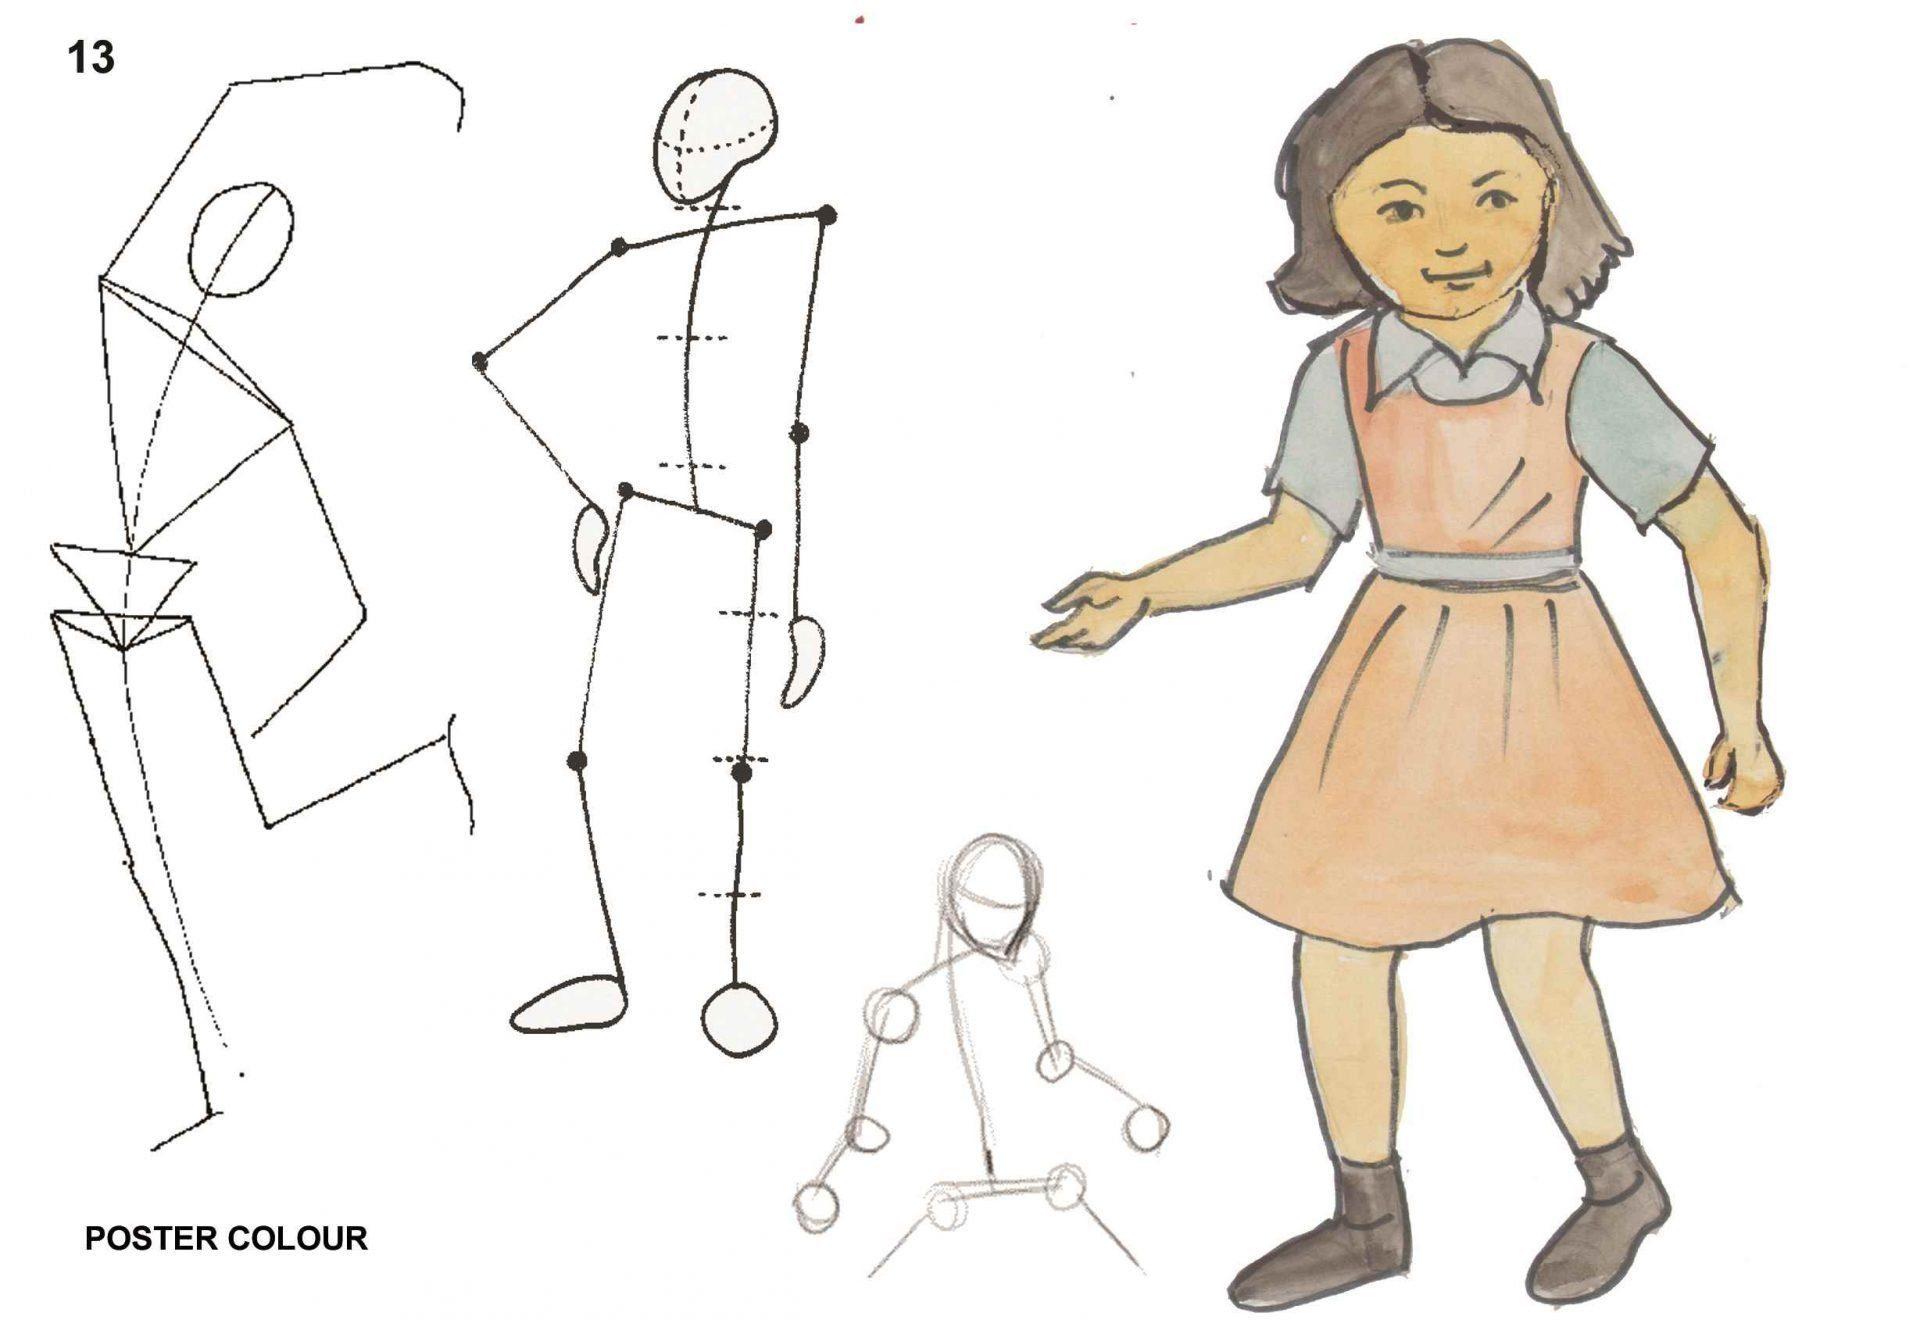 human figure & anatomy - Human Figure Anatomy C05 04 3 - Human Figure & Anatomy